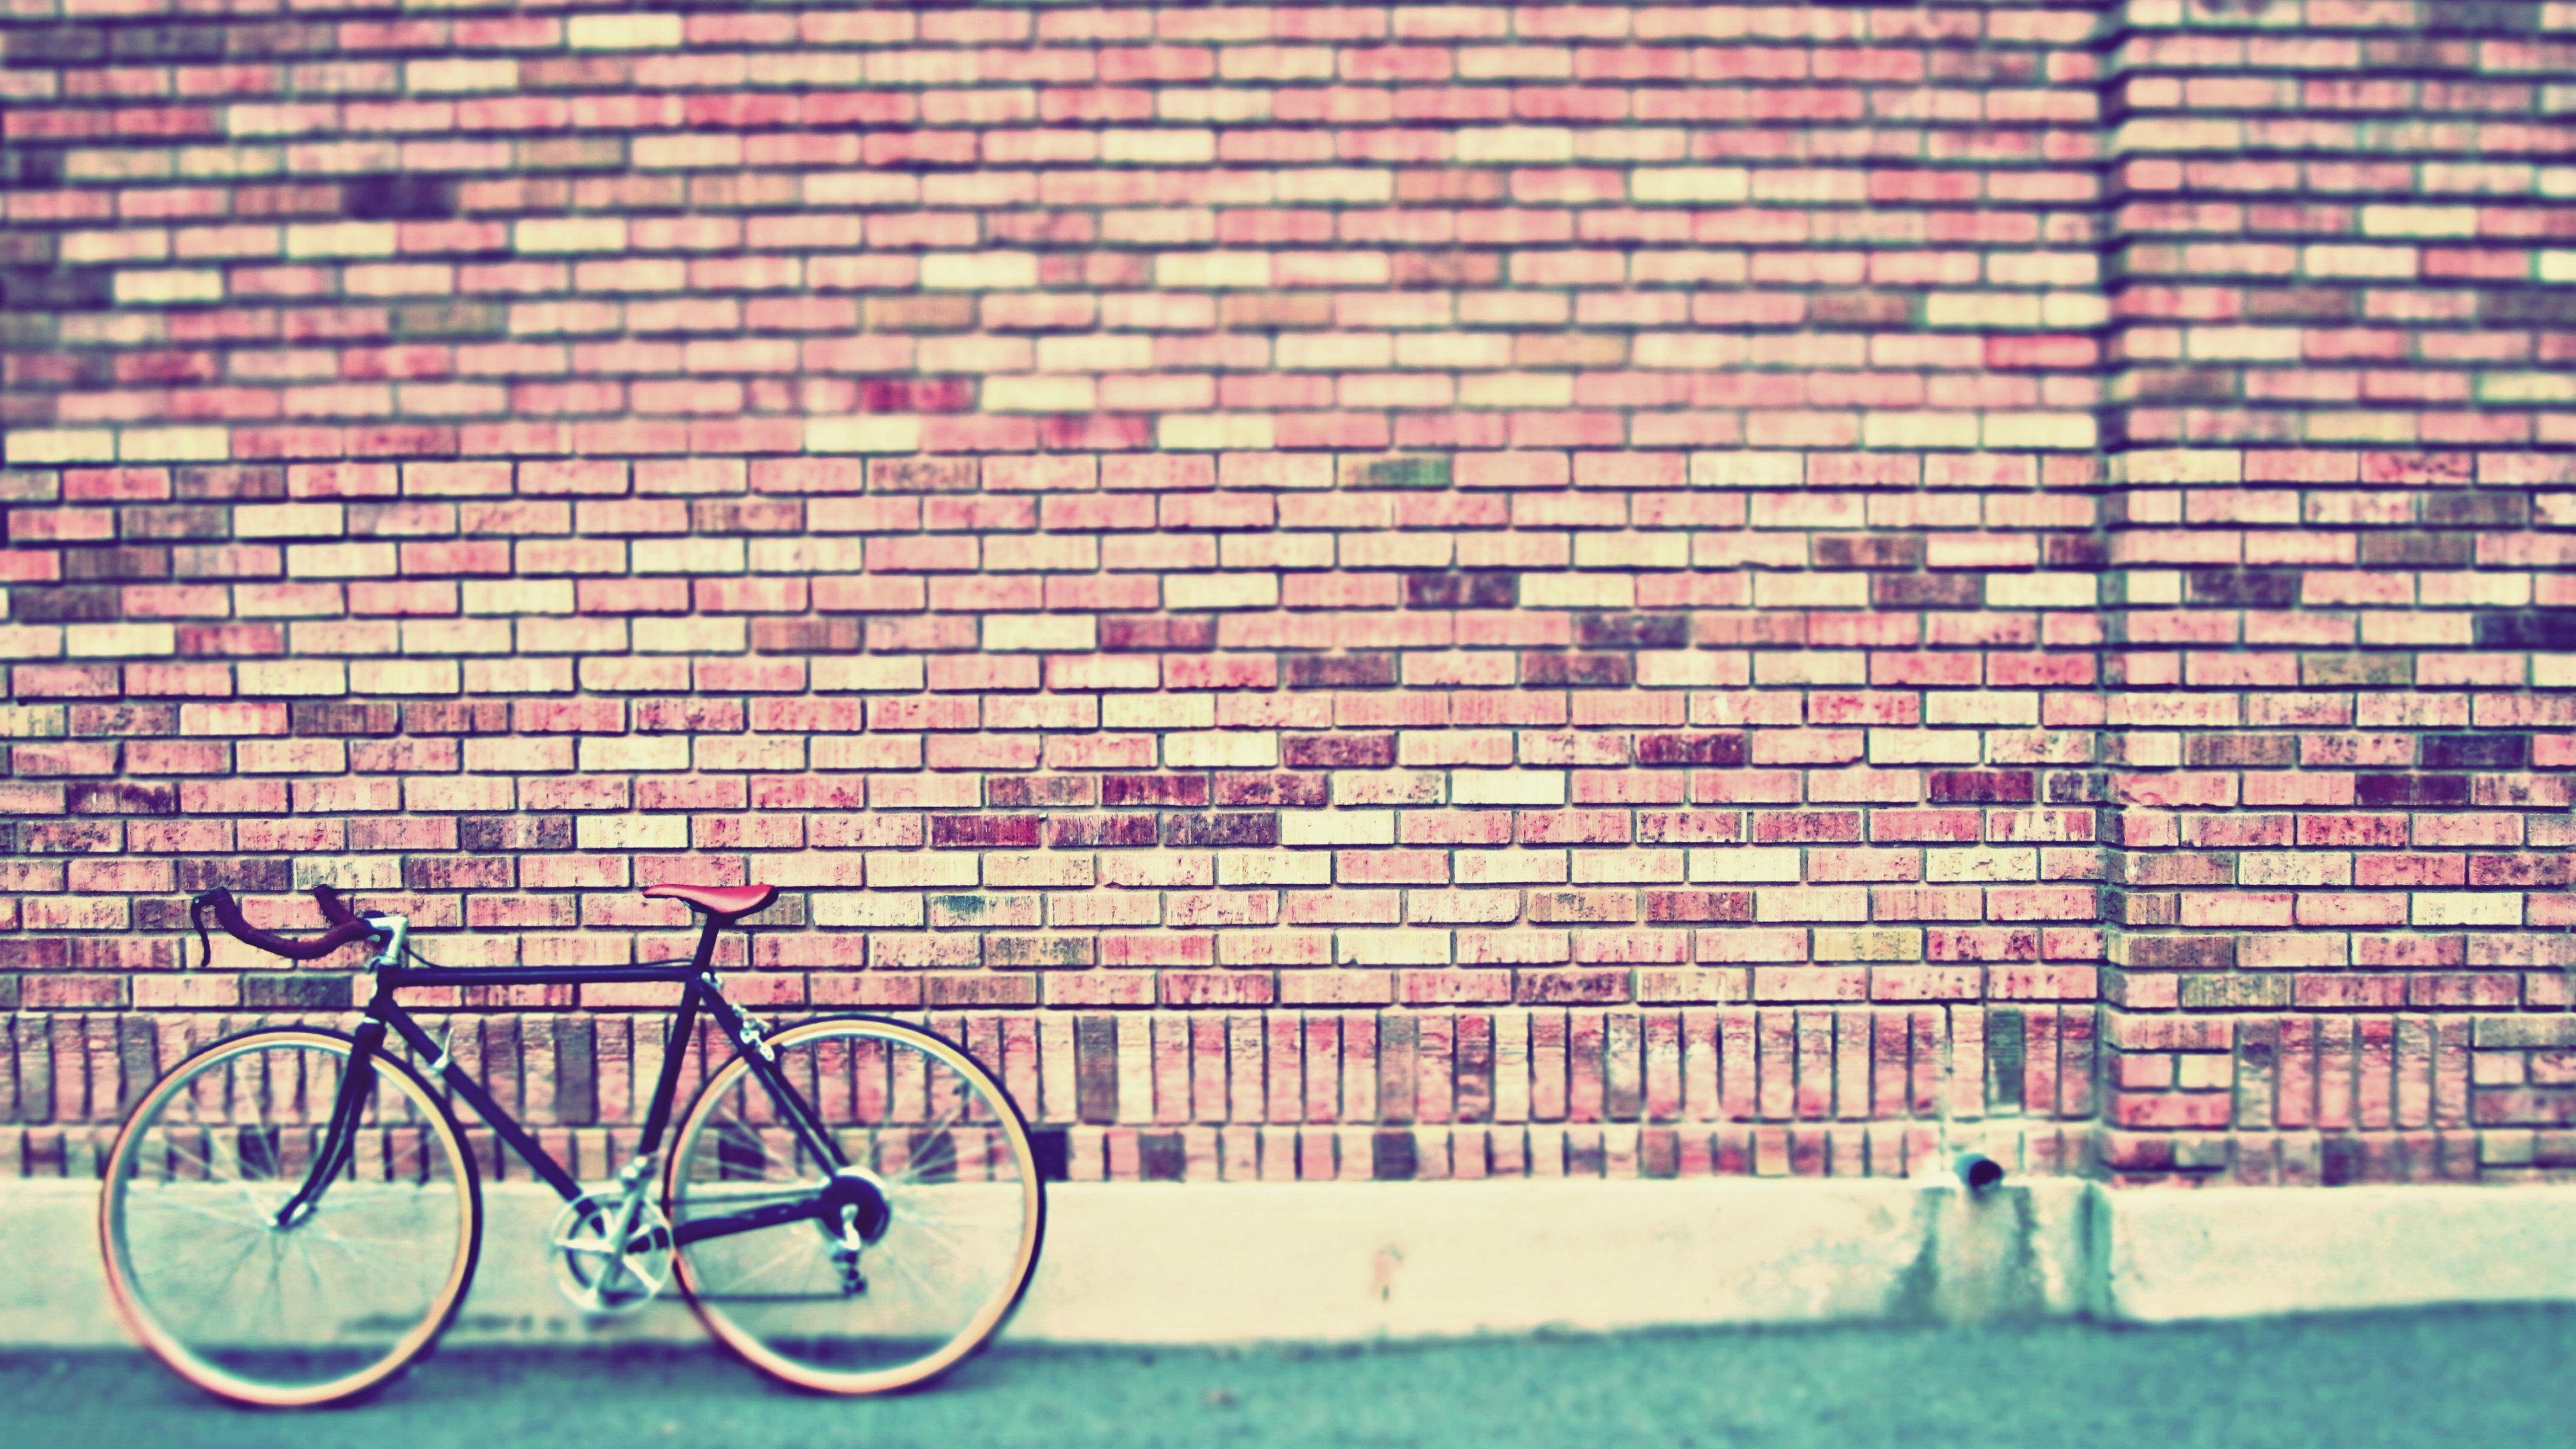 Retro Bike On Wall Wallpapers Hd / Desktop And Mobile - Vintage Desktop Backgrounds - HD Wallpaper